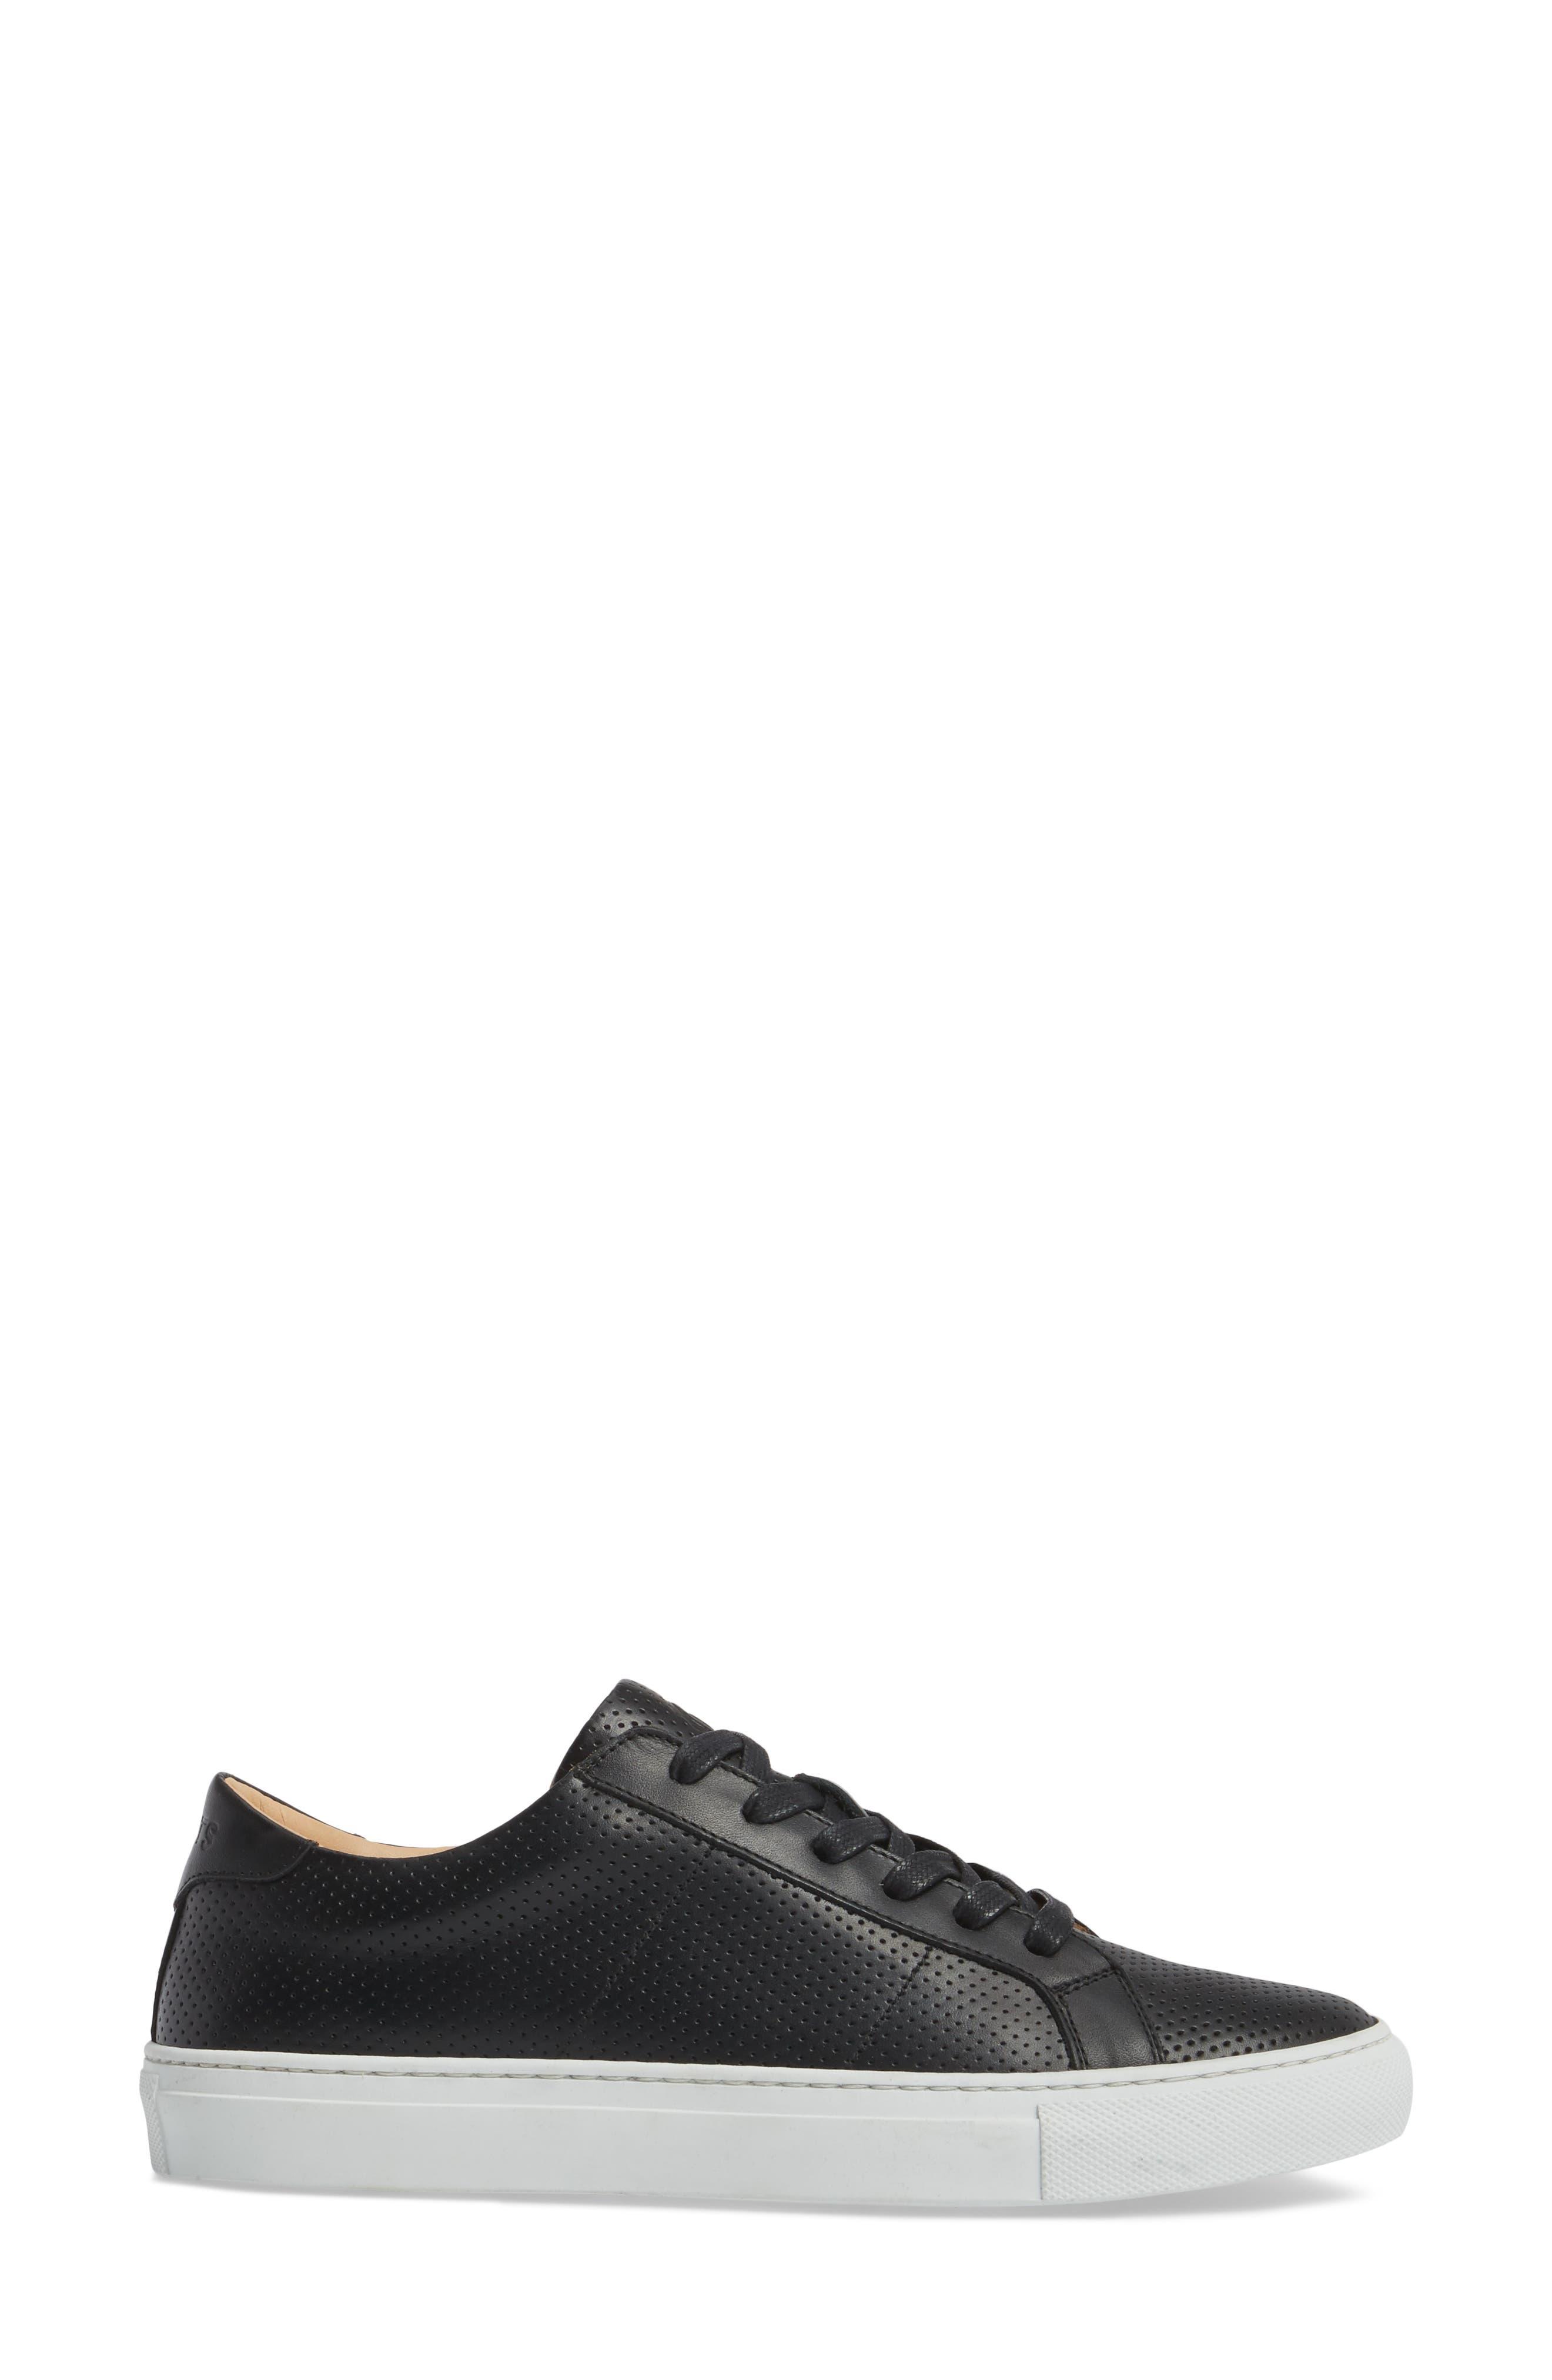 Royale Low Top Sneaker,                             Alternate thumbnail 3, color,                             BLACK PERFORATED